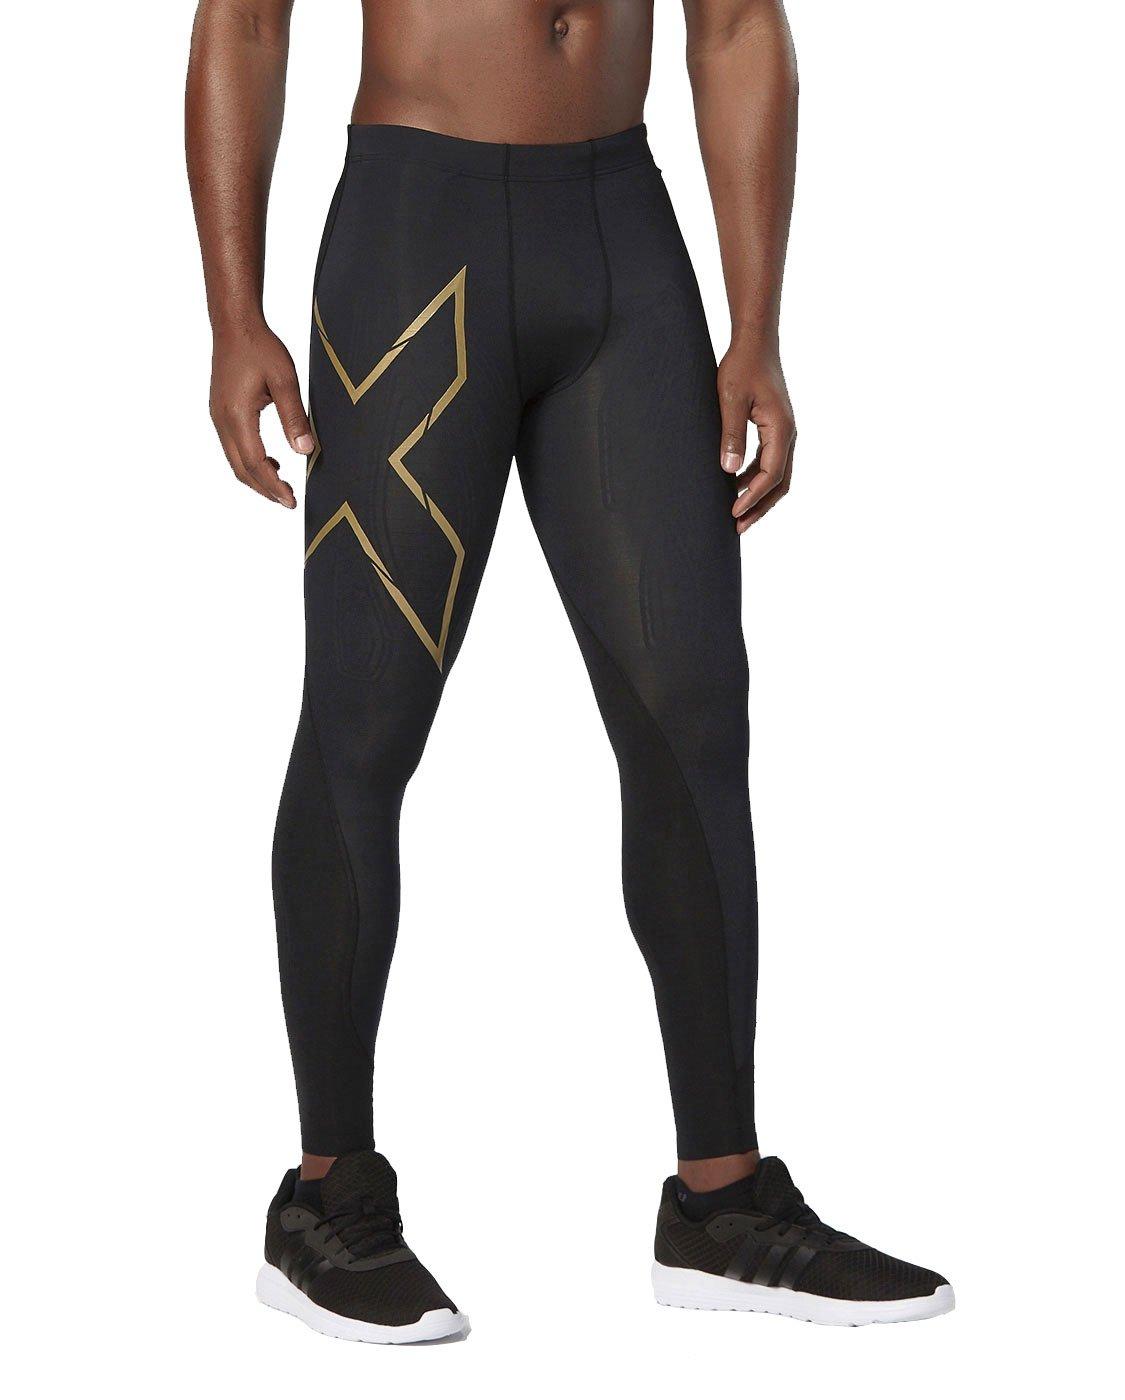 2XU Men's Elite MCS Compression Tights, Black/Gold, X-Large